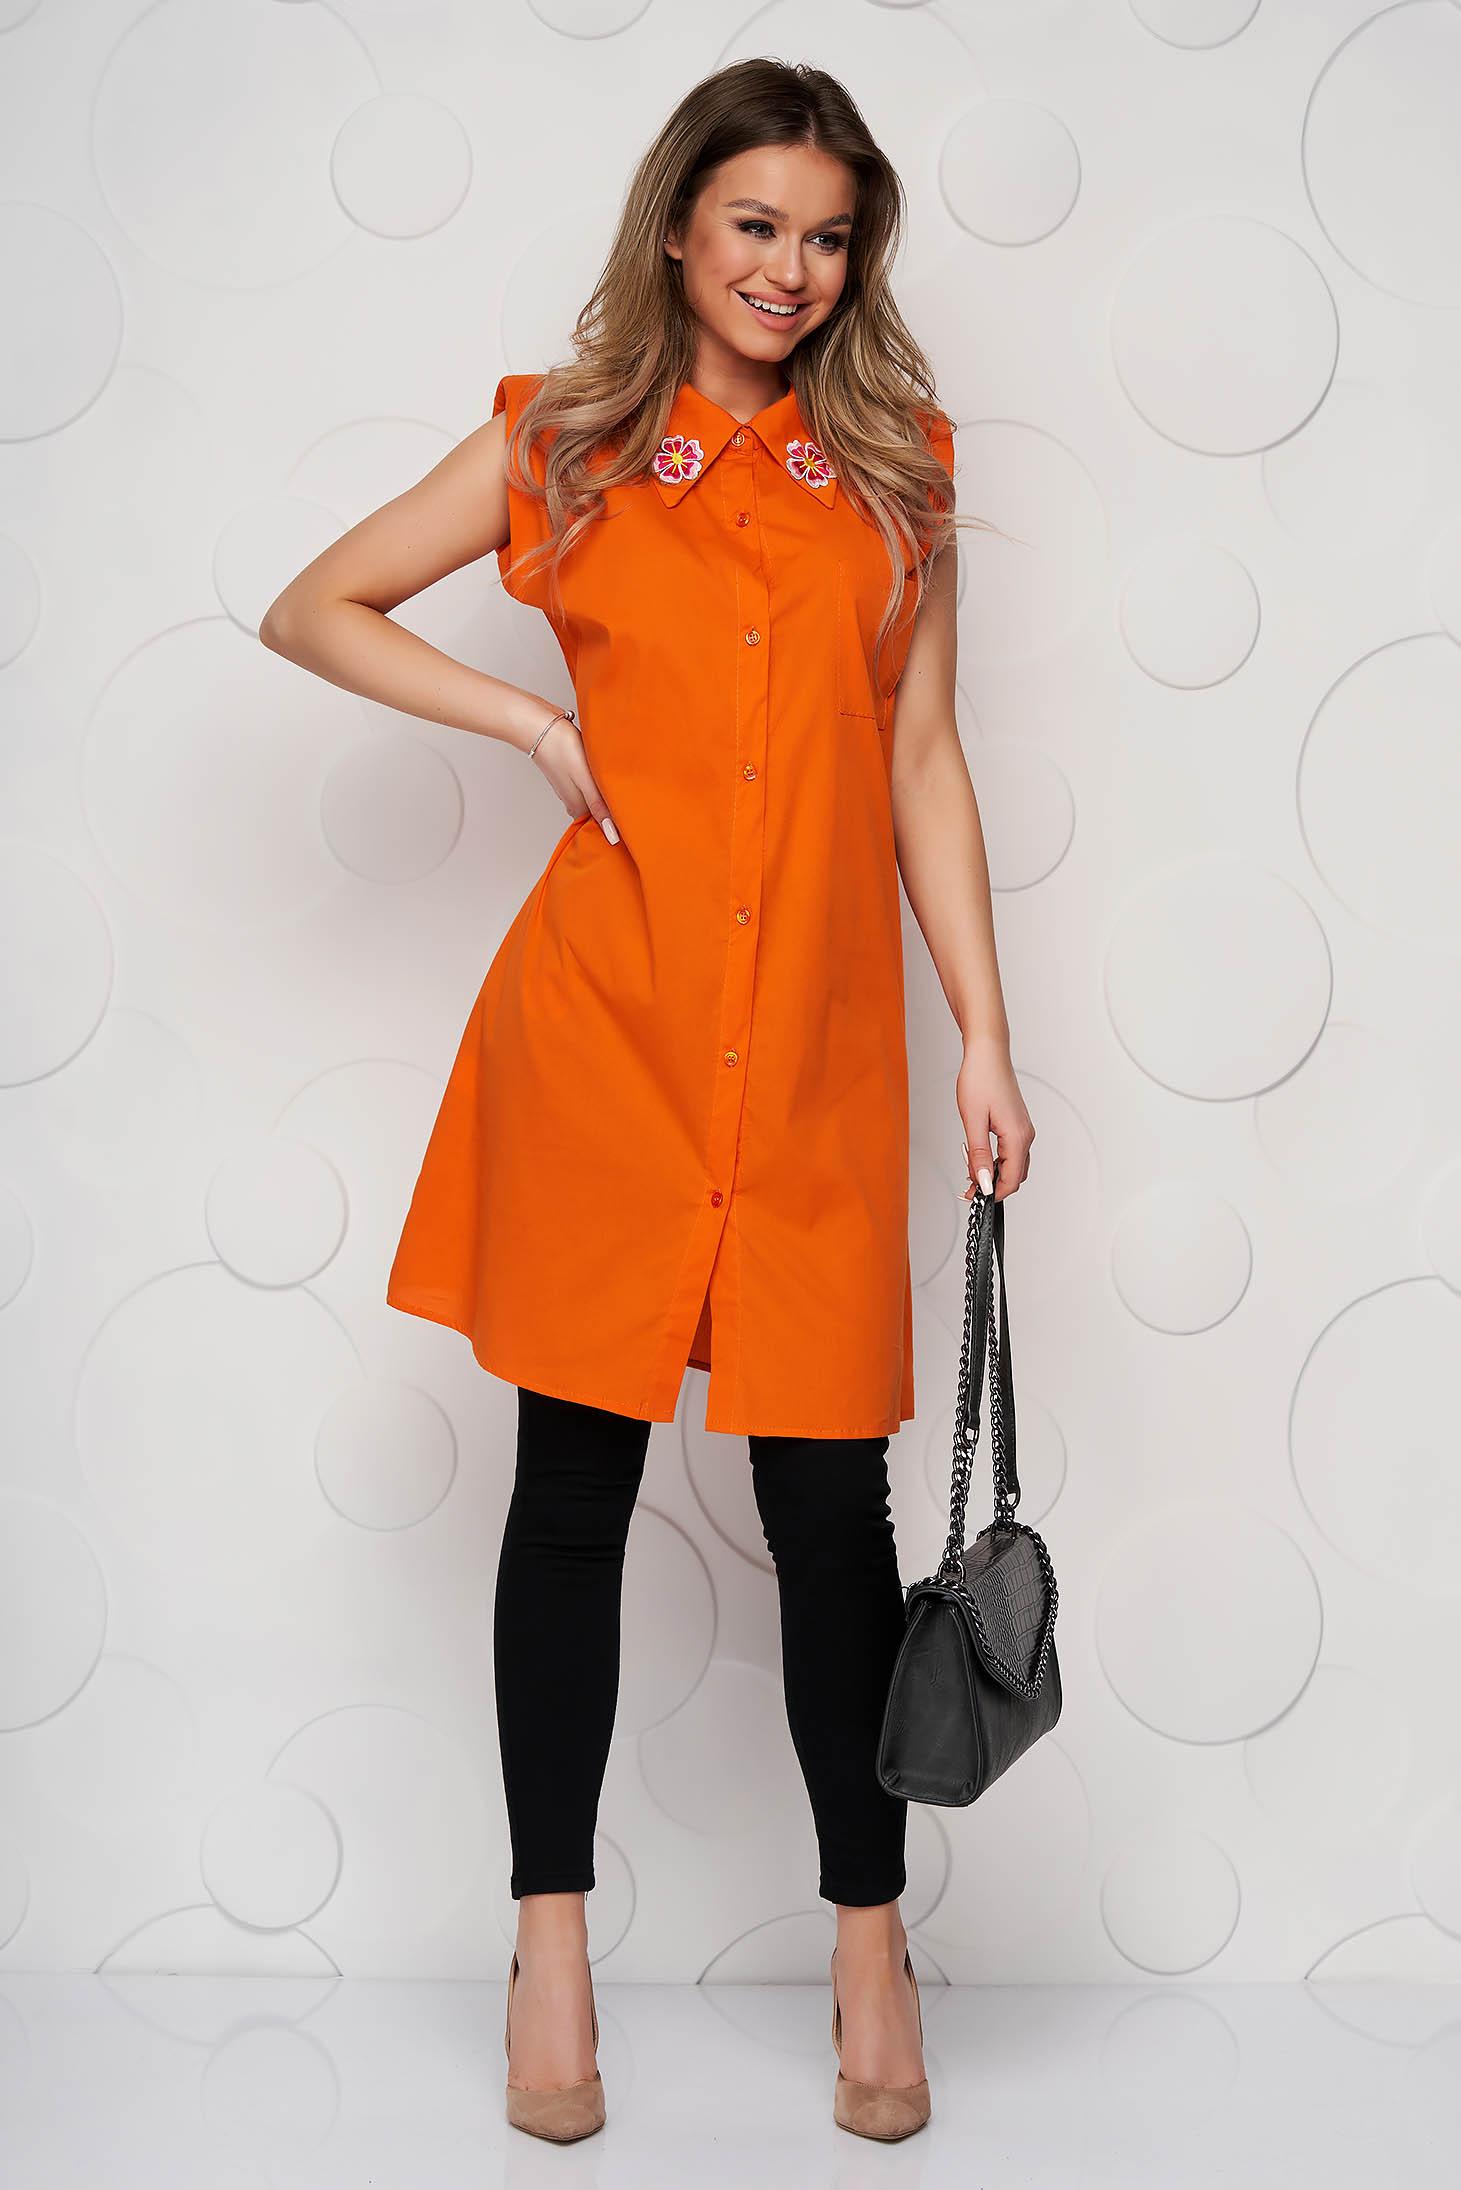 Camasa dama SunShine portocalie brodata din bumbac subtire cu croi larg si maneca scurta